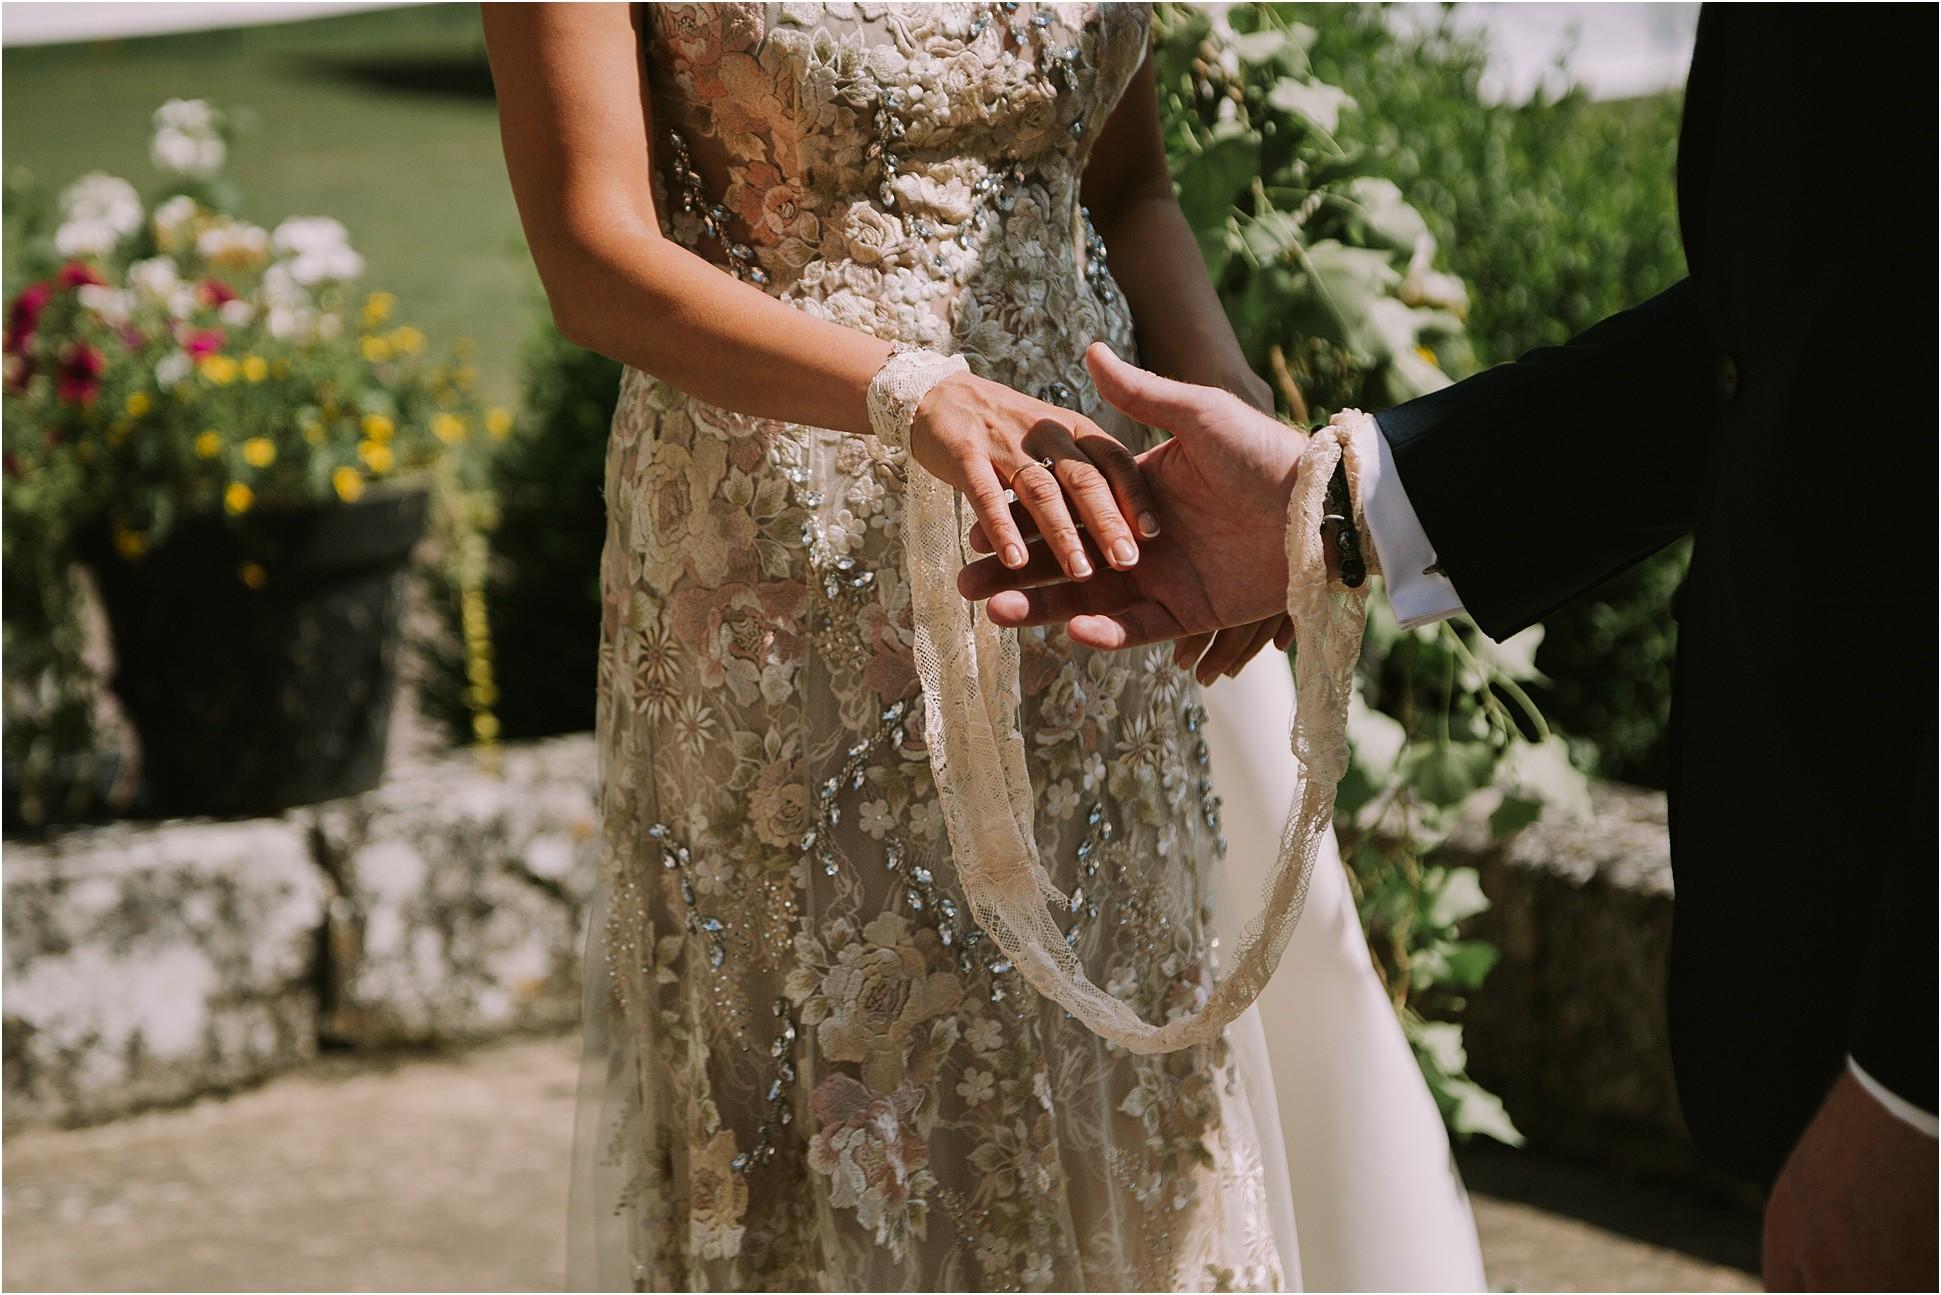 Kateryna-photos-photographe-mariage-chateau-st-paterne-mayenne-normandie_0116.jpg